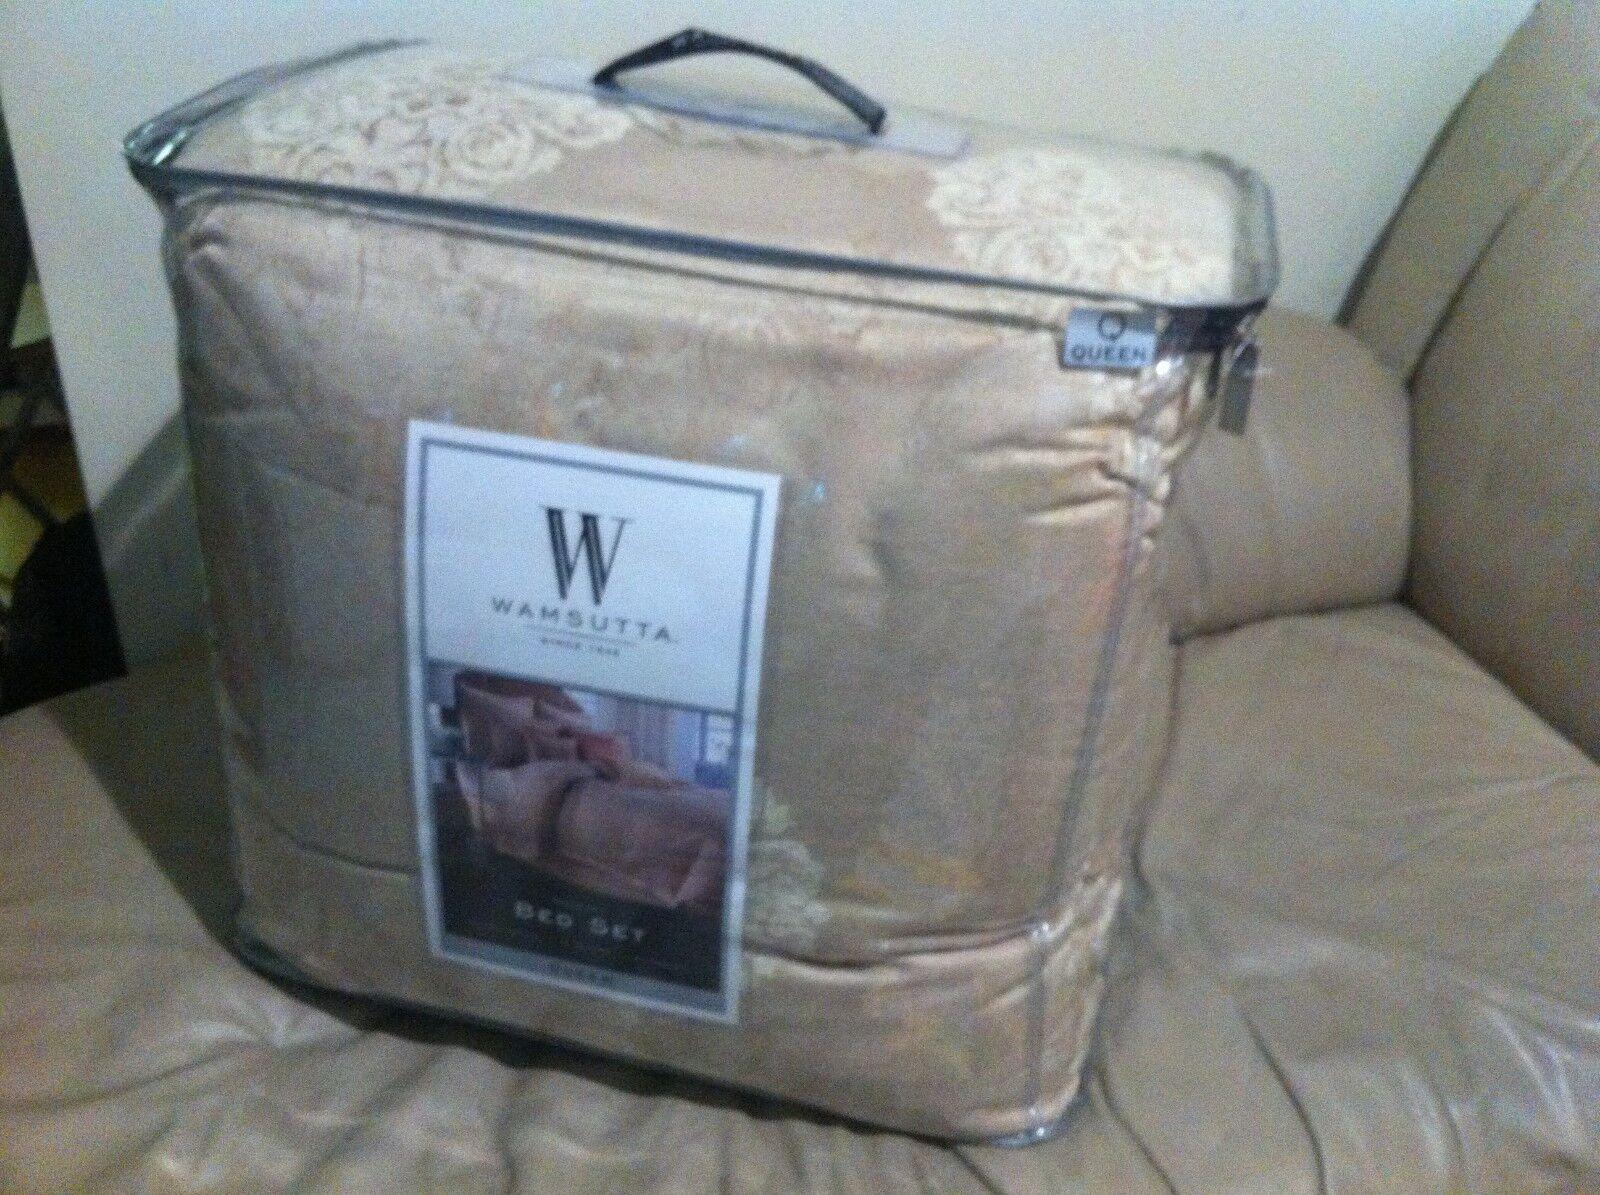 New Wamsutta MADEIRA 4PC Comforter Shams Bedskirt Bed Set Queen Dimensione